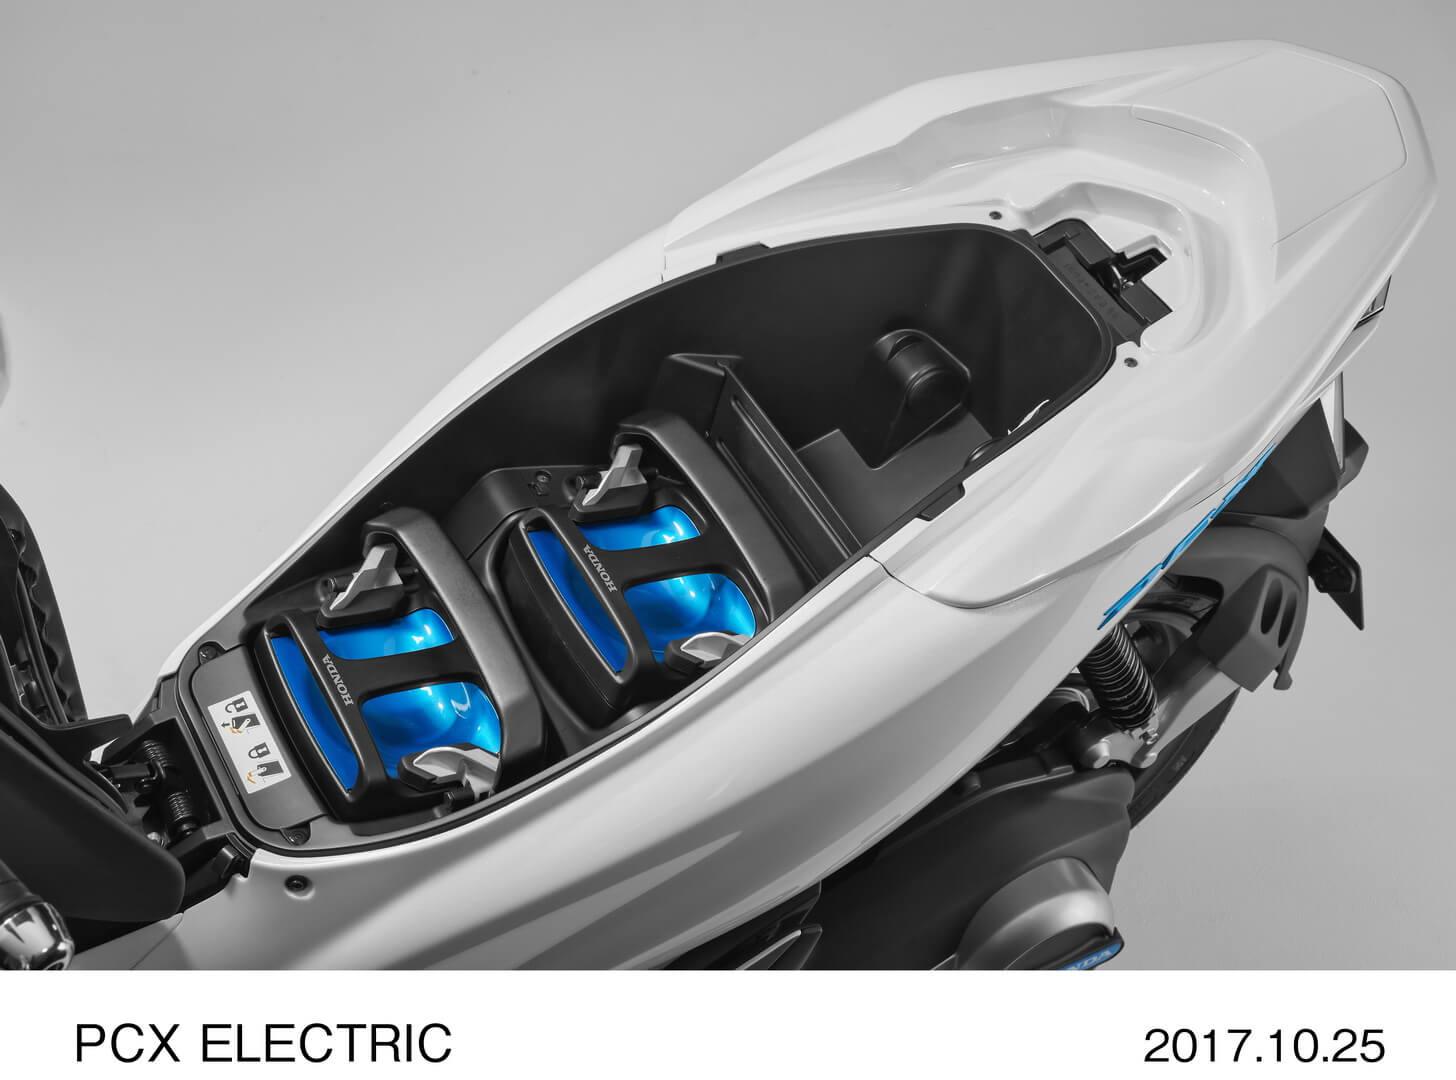 Honda PCXElectric с аккумуляторным блоком Mobile Power Pack